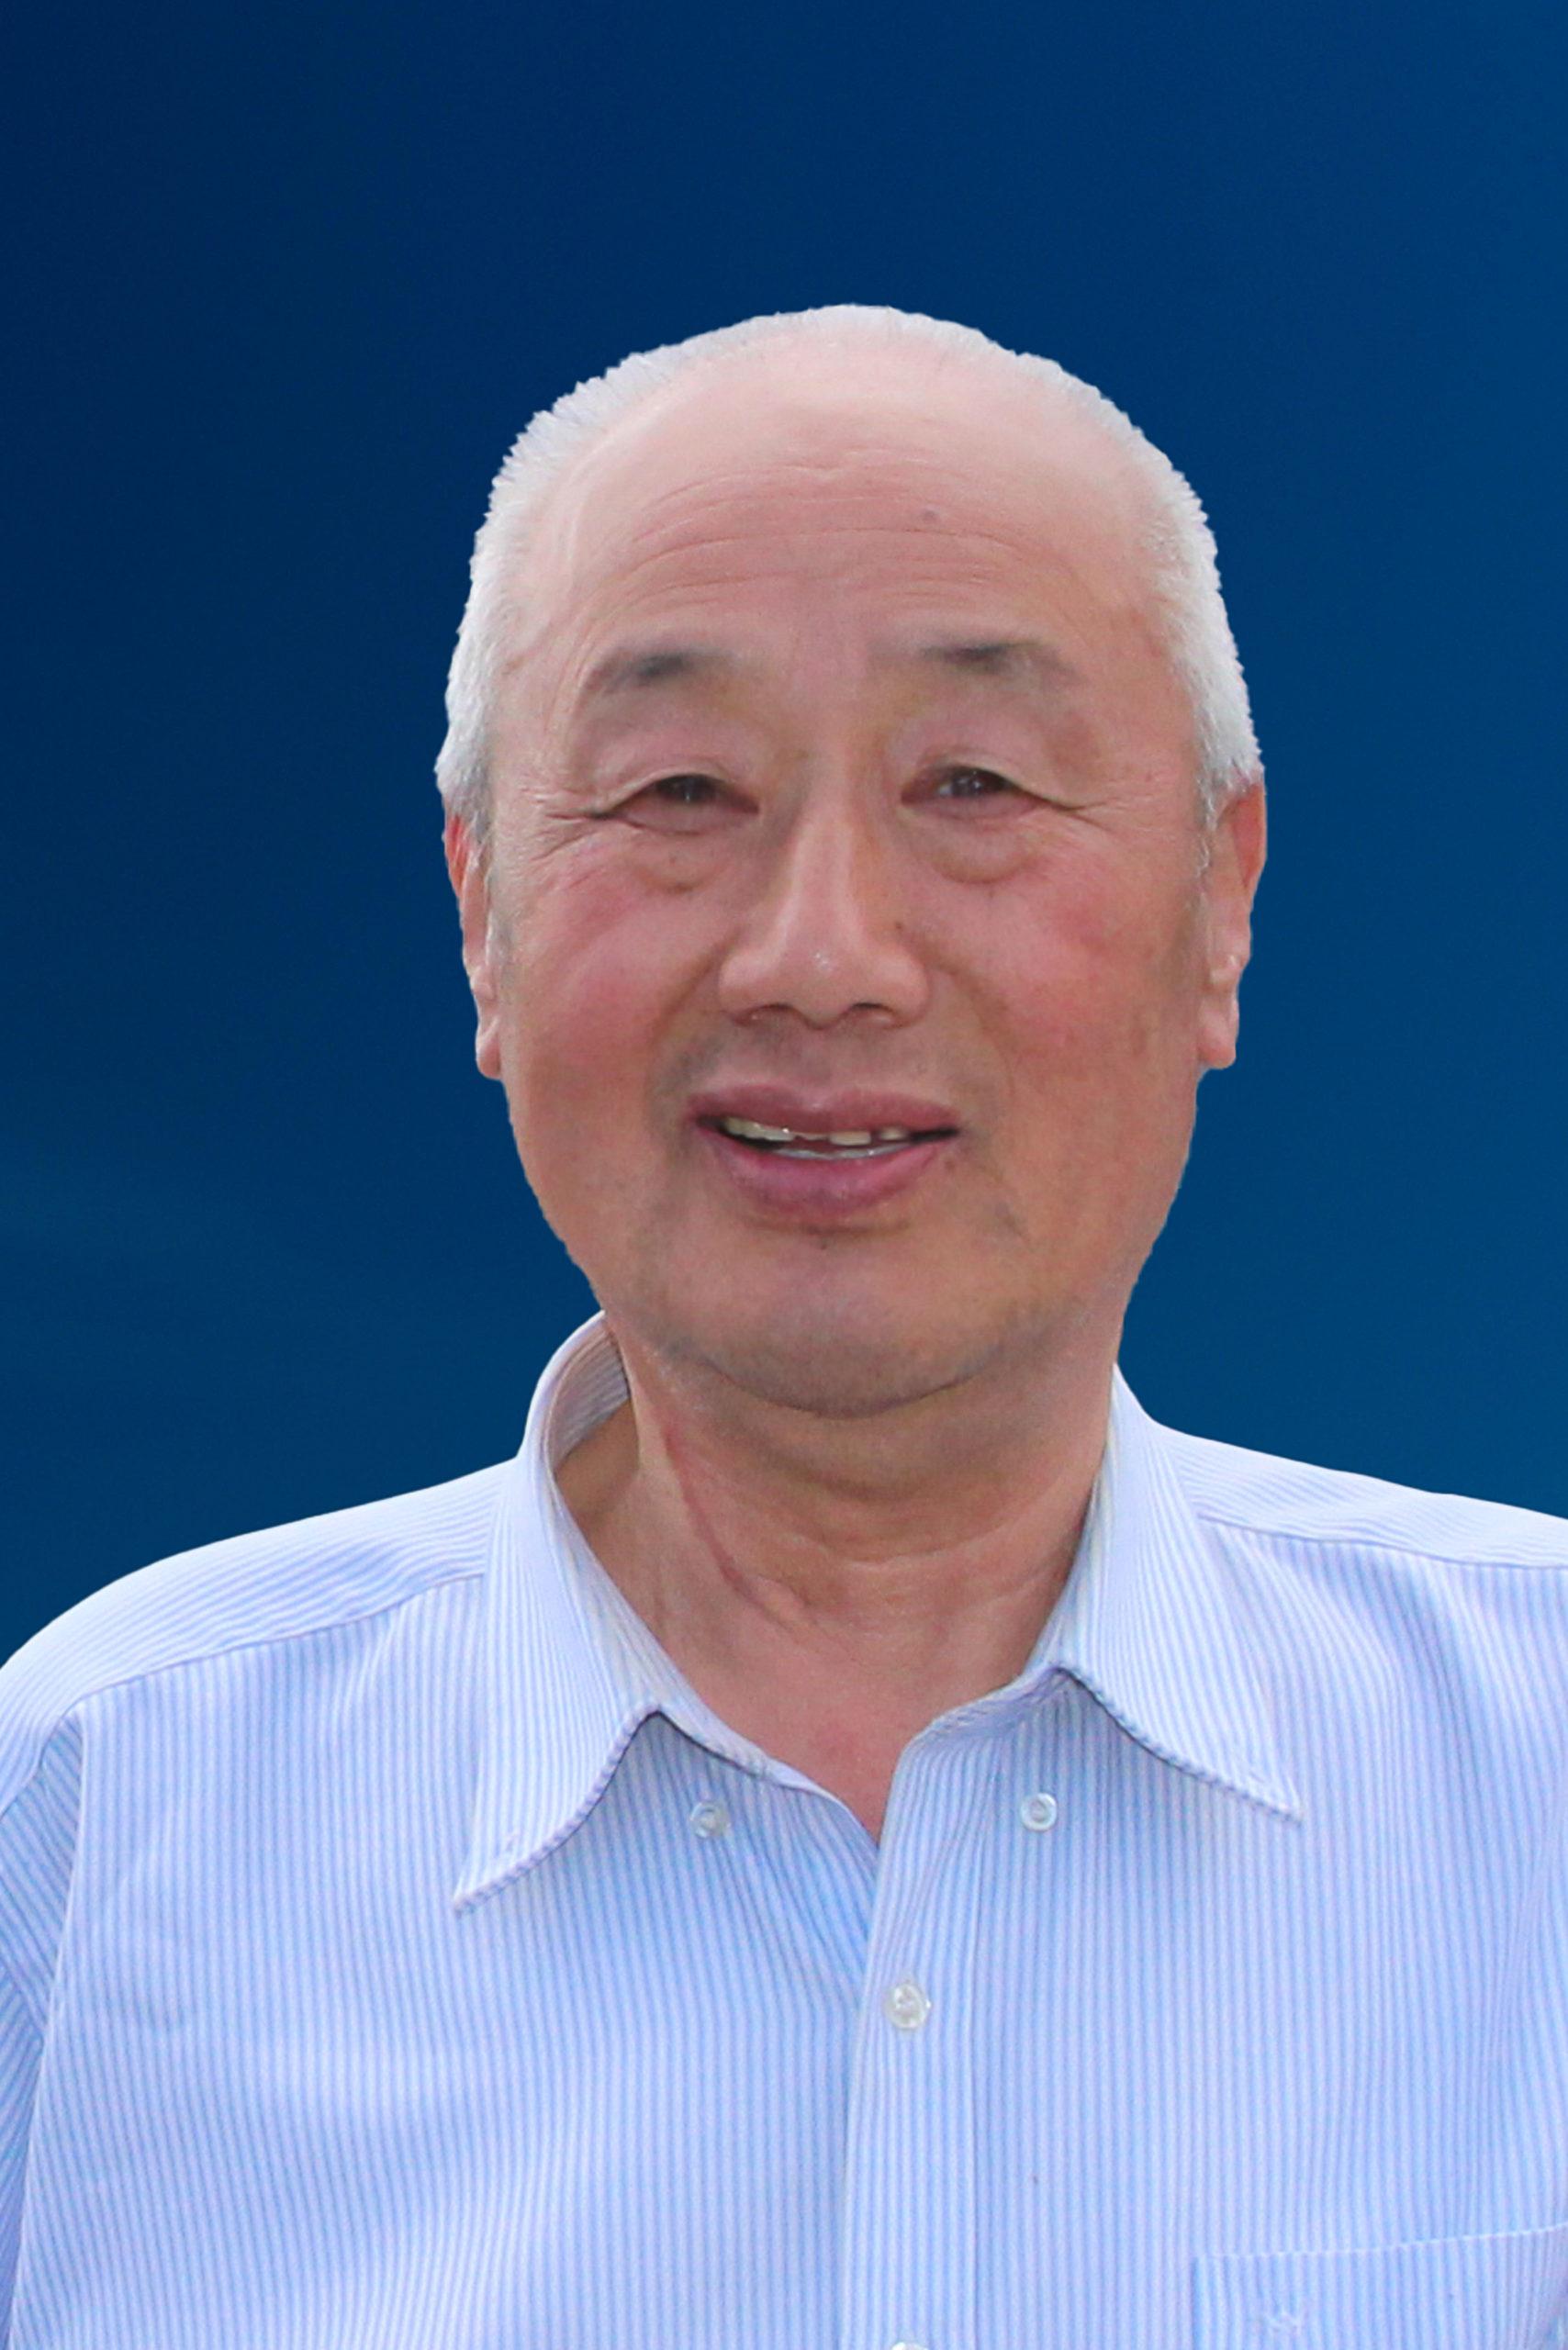 Wenyi Duan